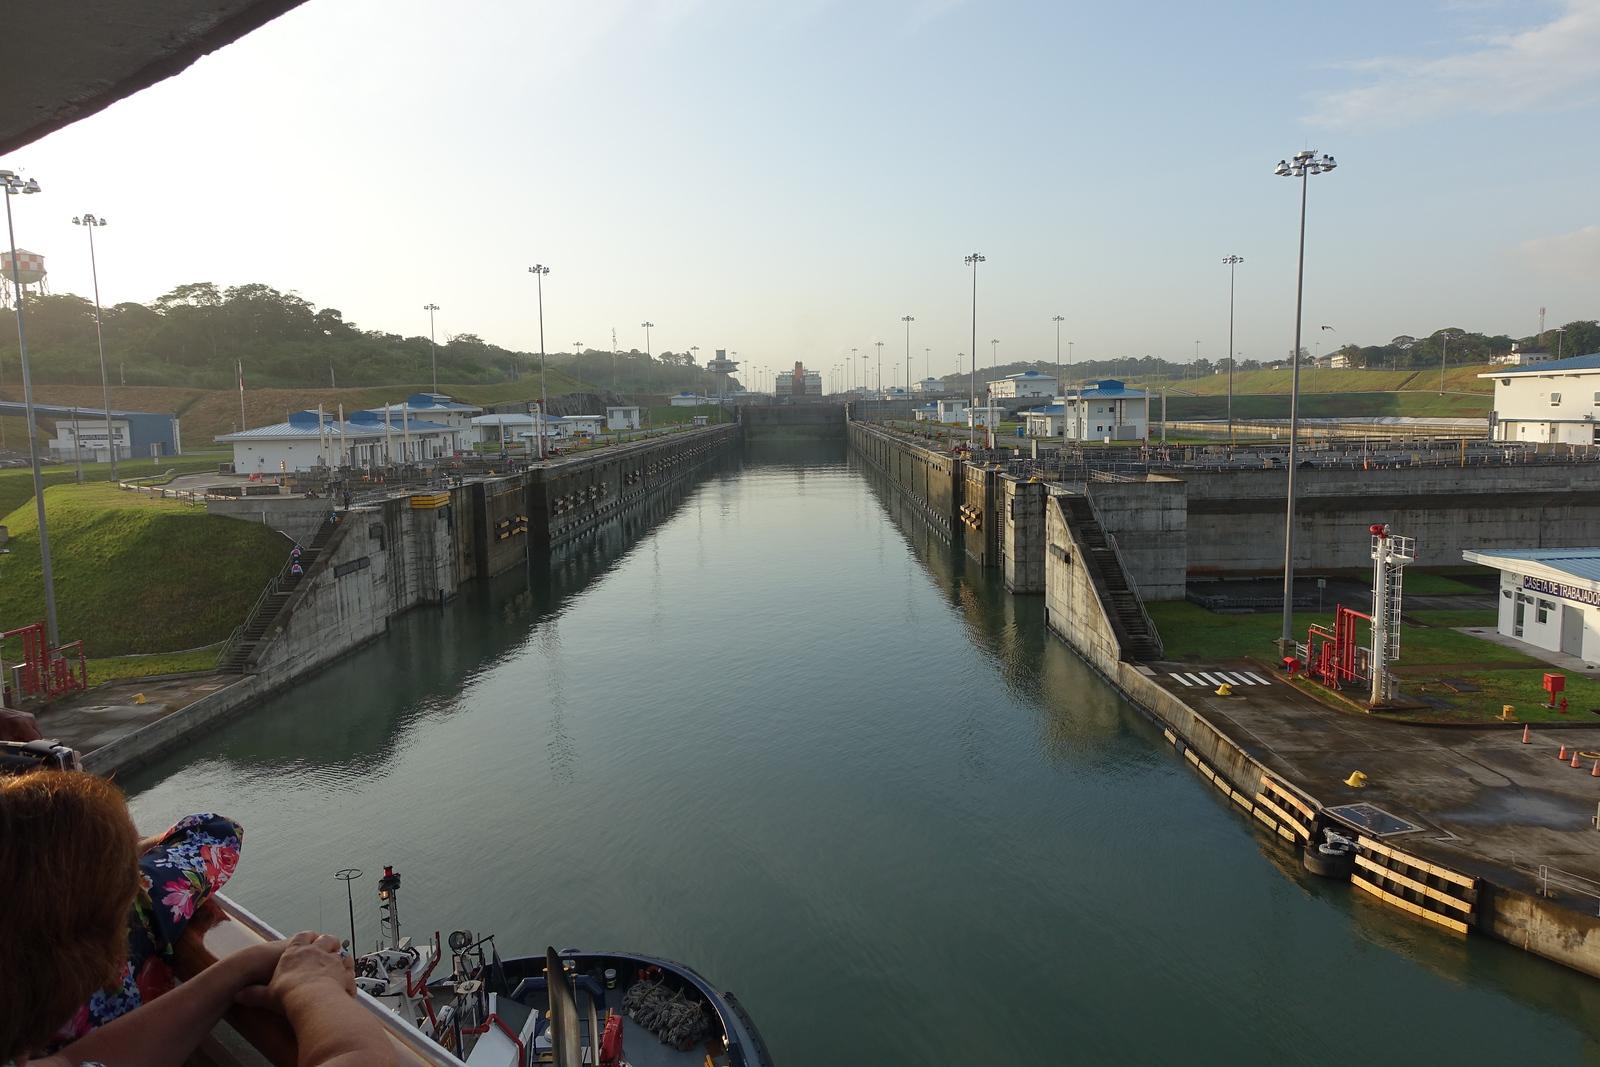 Entry Through Panama Canal into Gatun Lake (3 Locks)